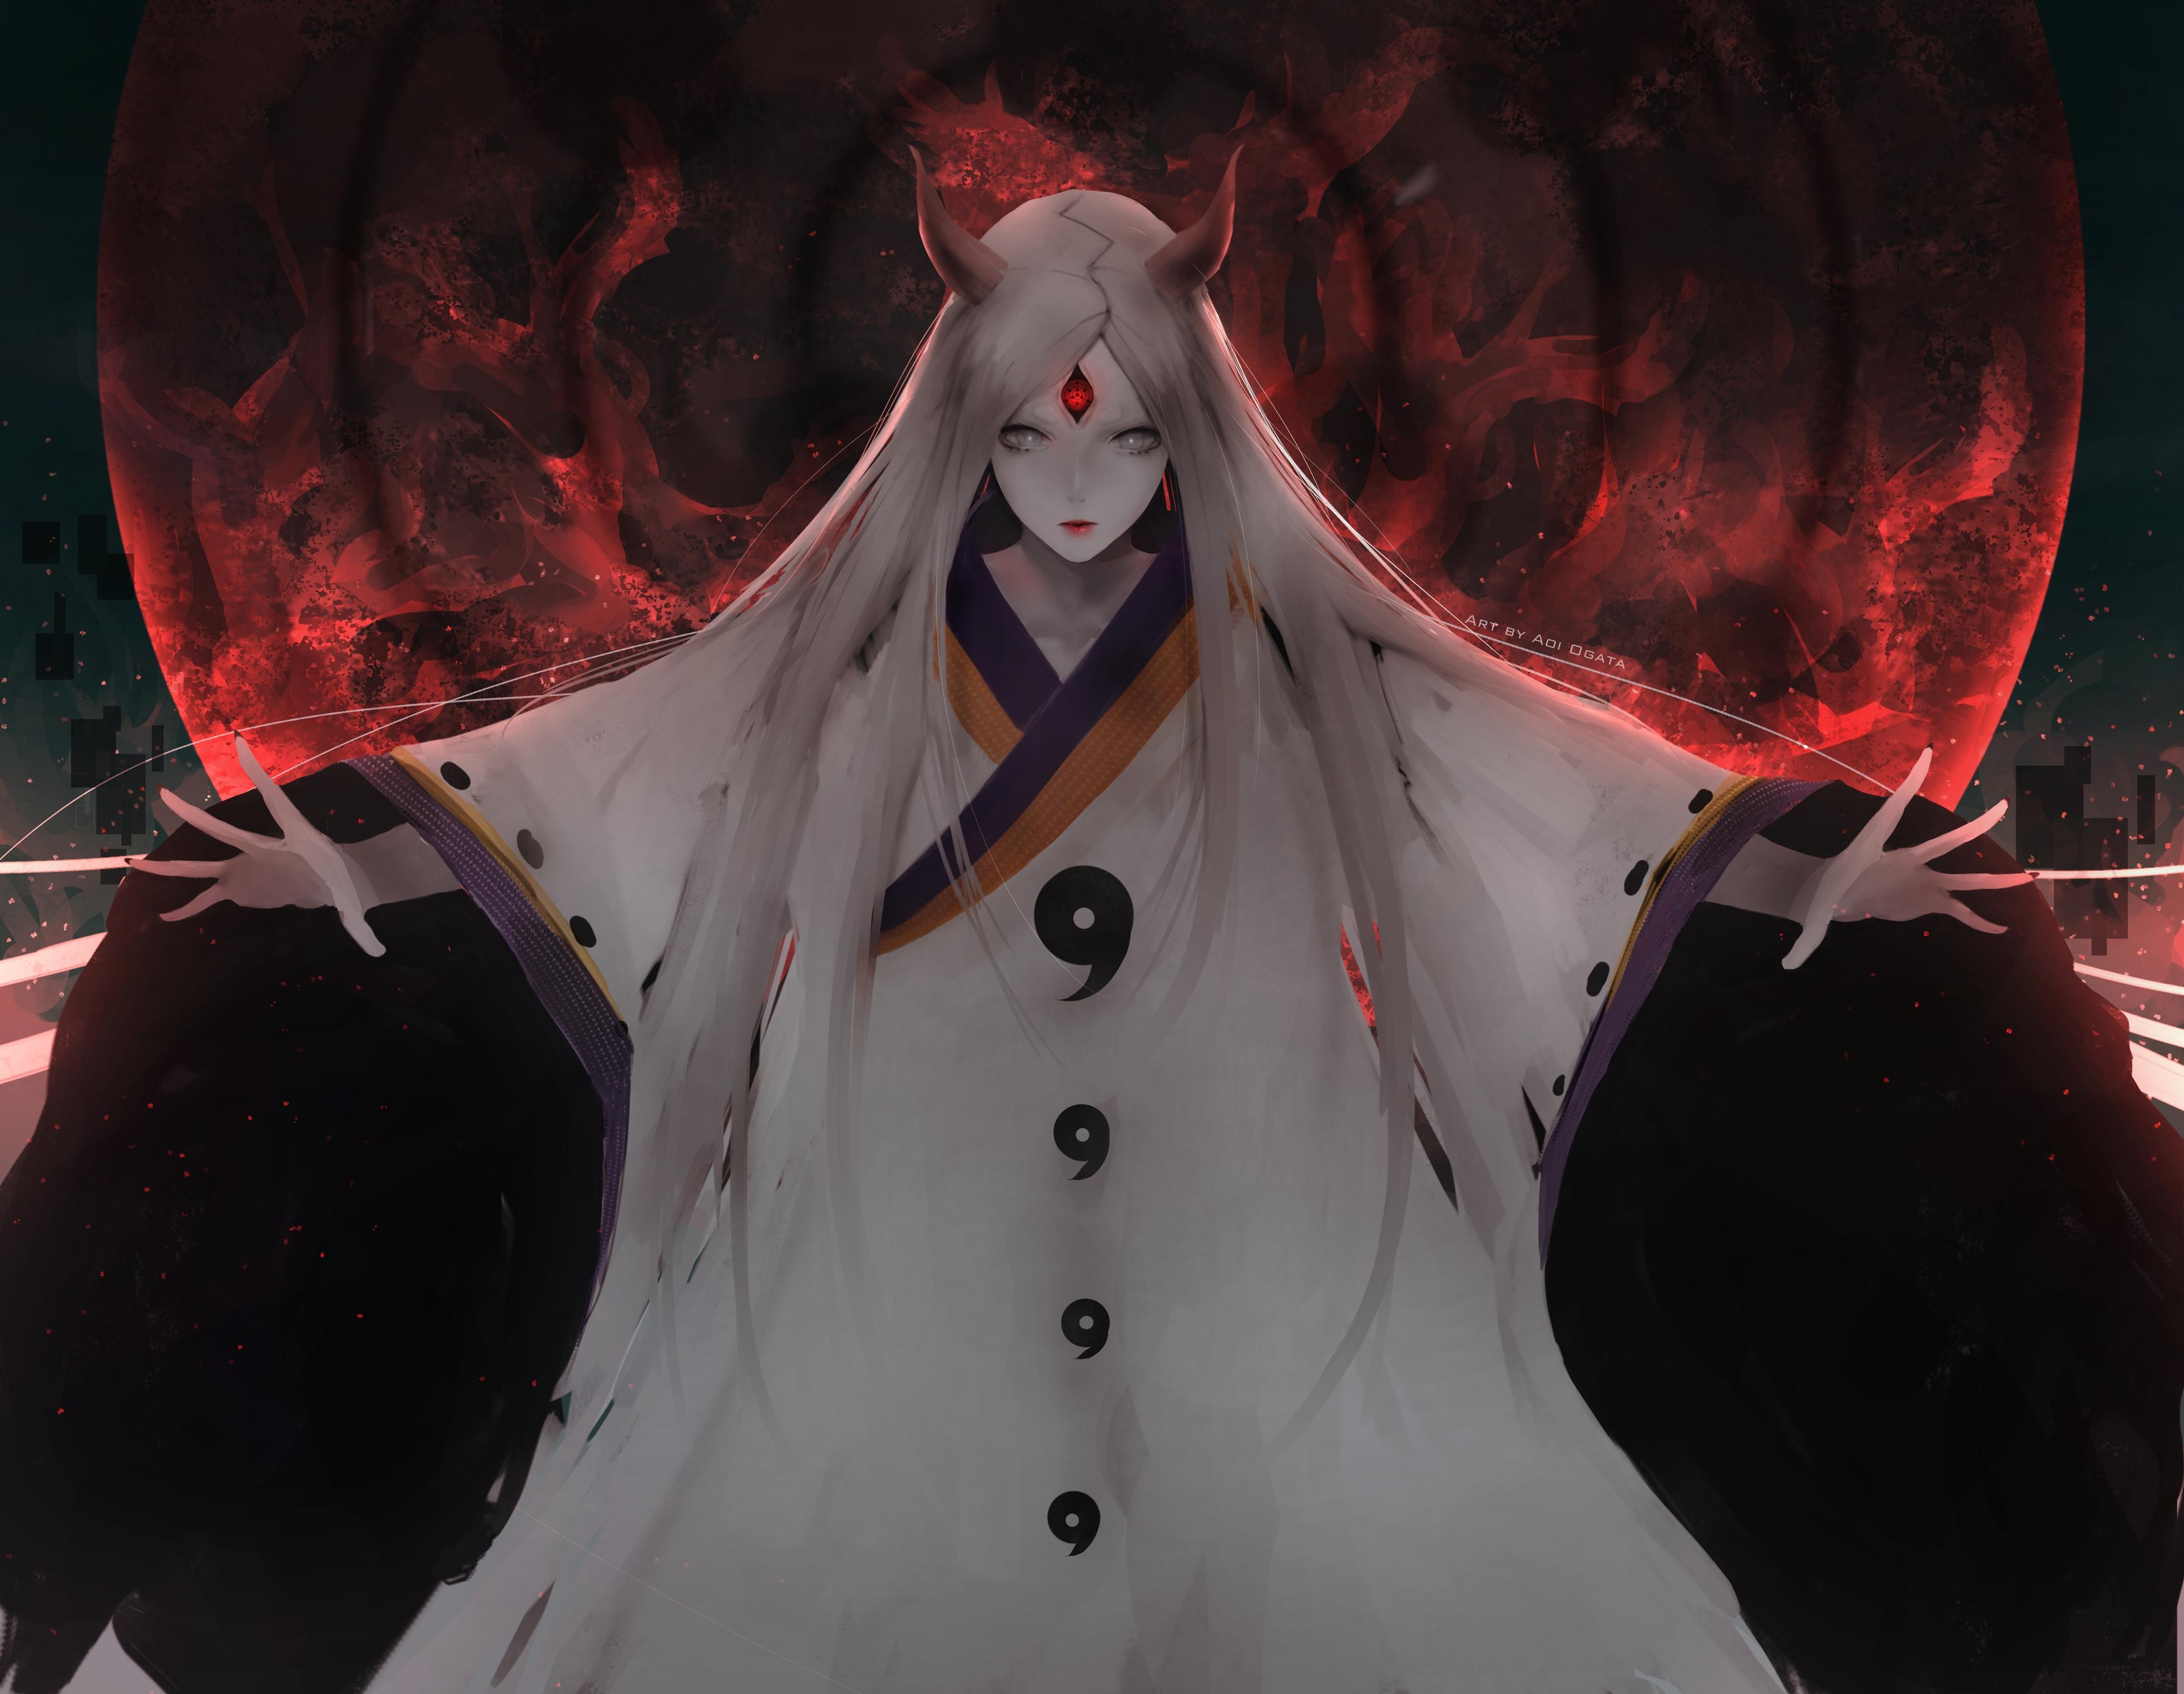 anime naruto artwork 4k 6e